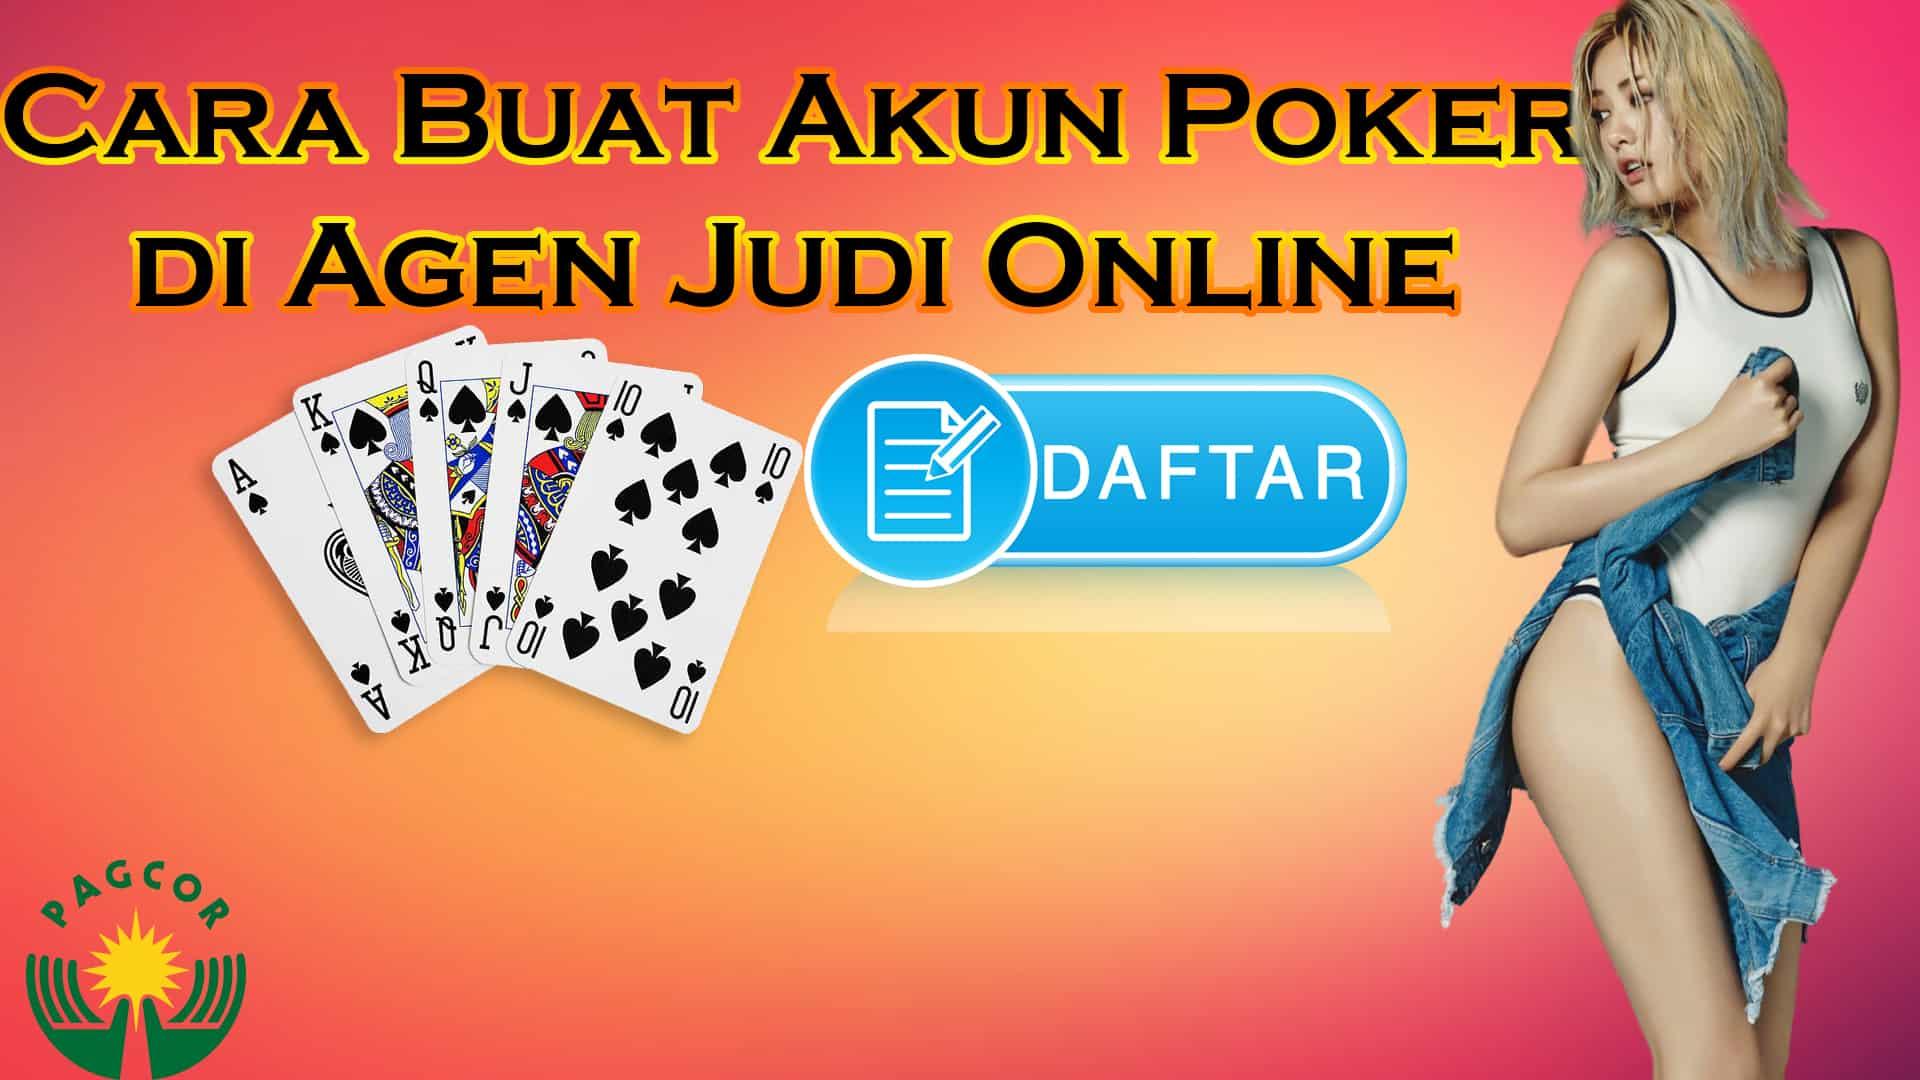 Cara Buat Akun Poker di Agen Judi Online